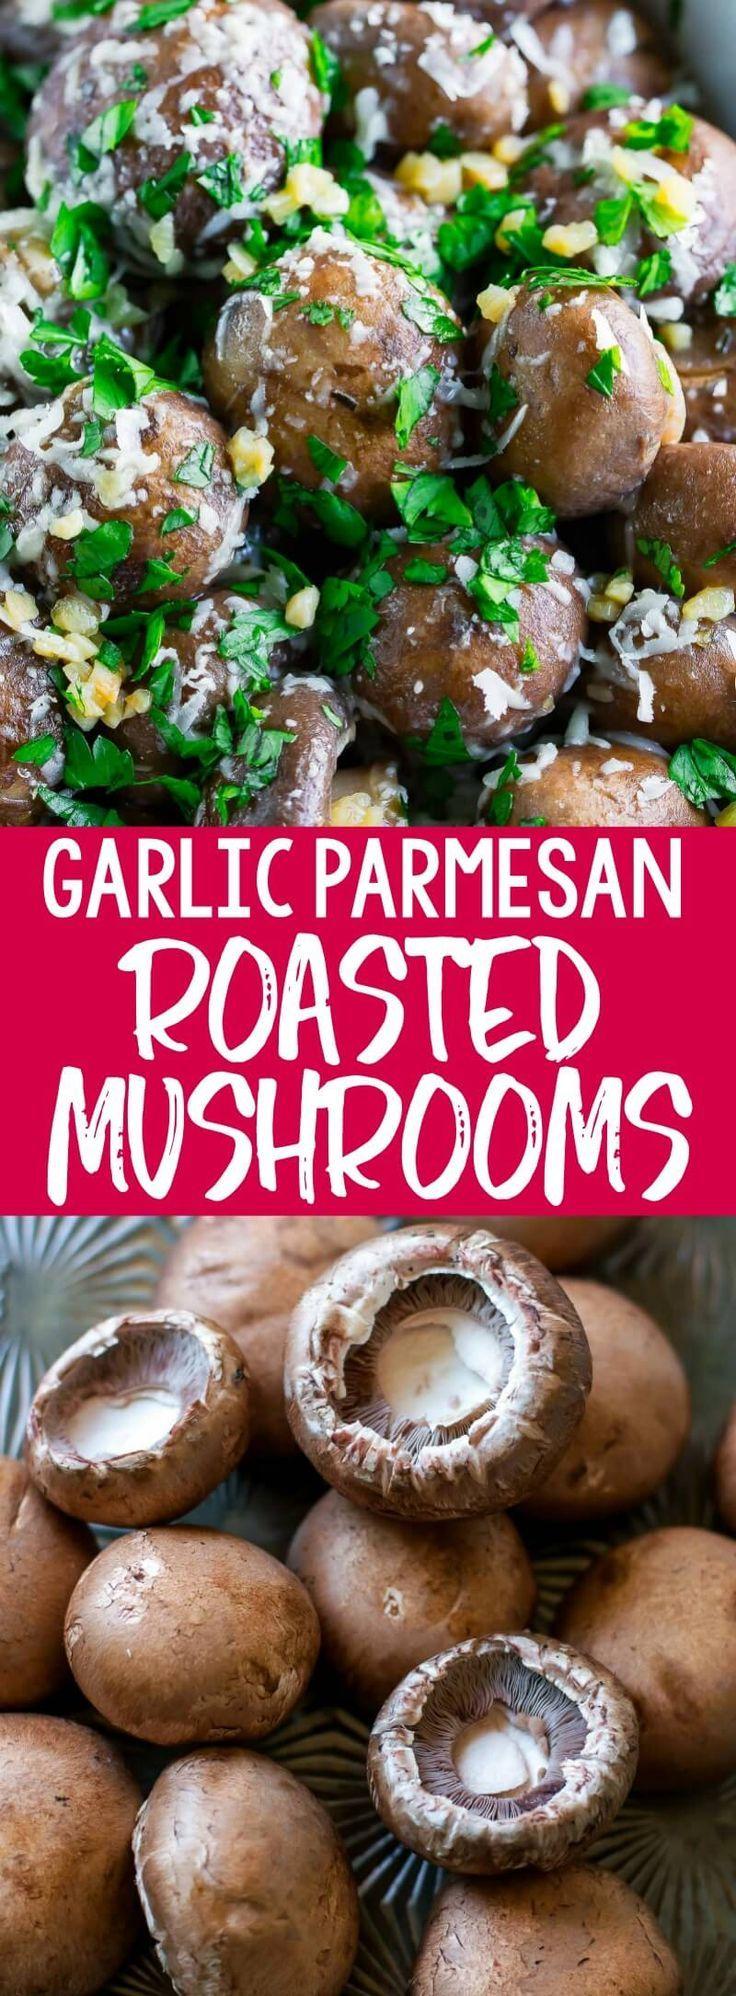 Garlic Parmesan Roasted Mushrooms Step up your side dish game with these Garlic Parmesan Roasted Mu